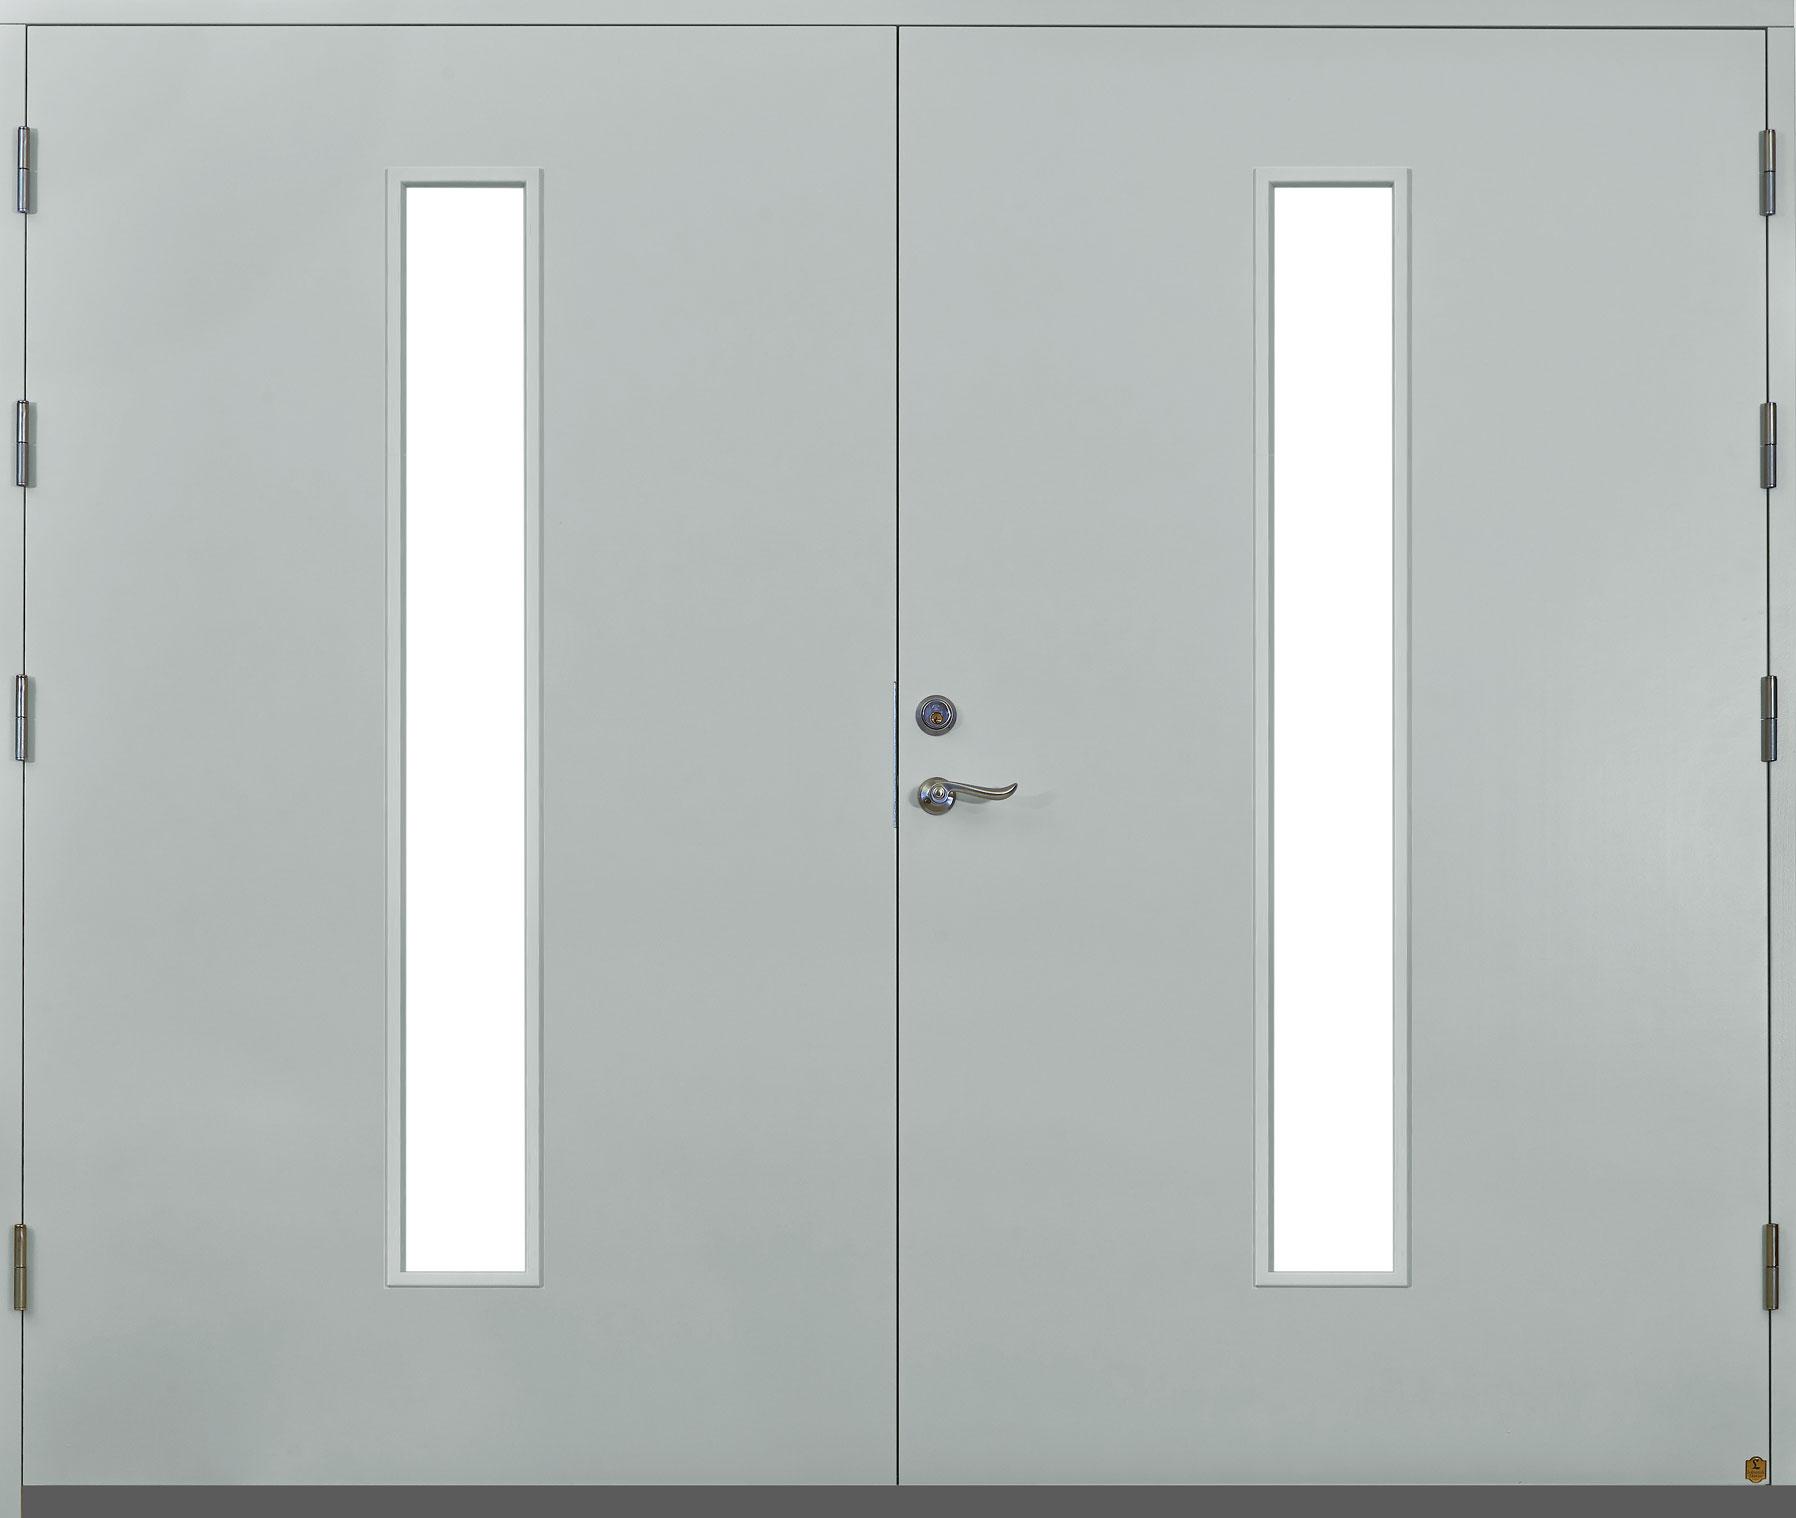 1518 #665E49 Garage Doors Leksandsdörren AB save image Ab Garage Doors 36471796